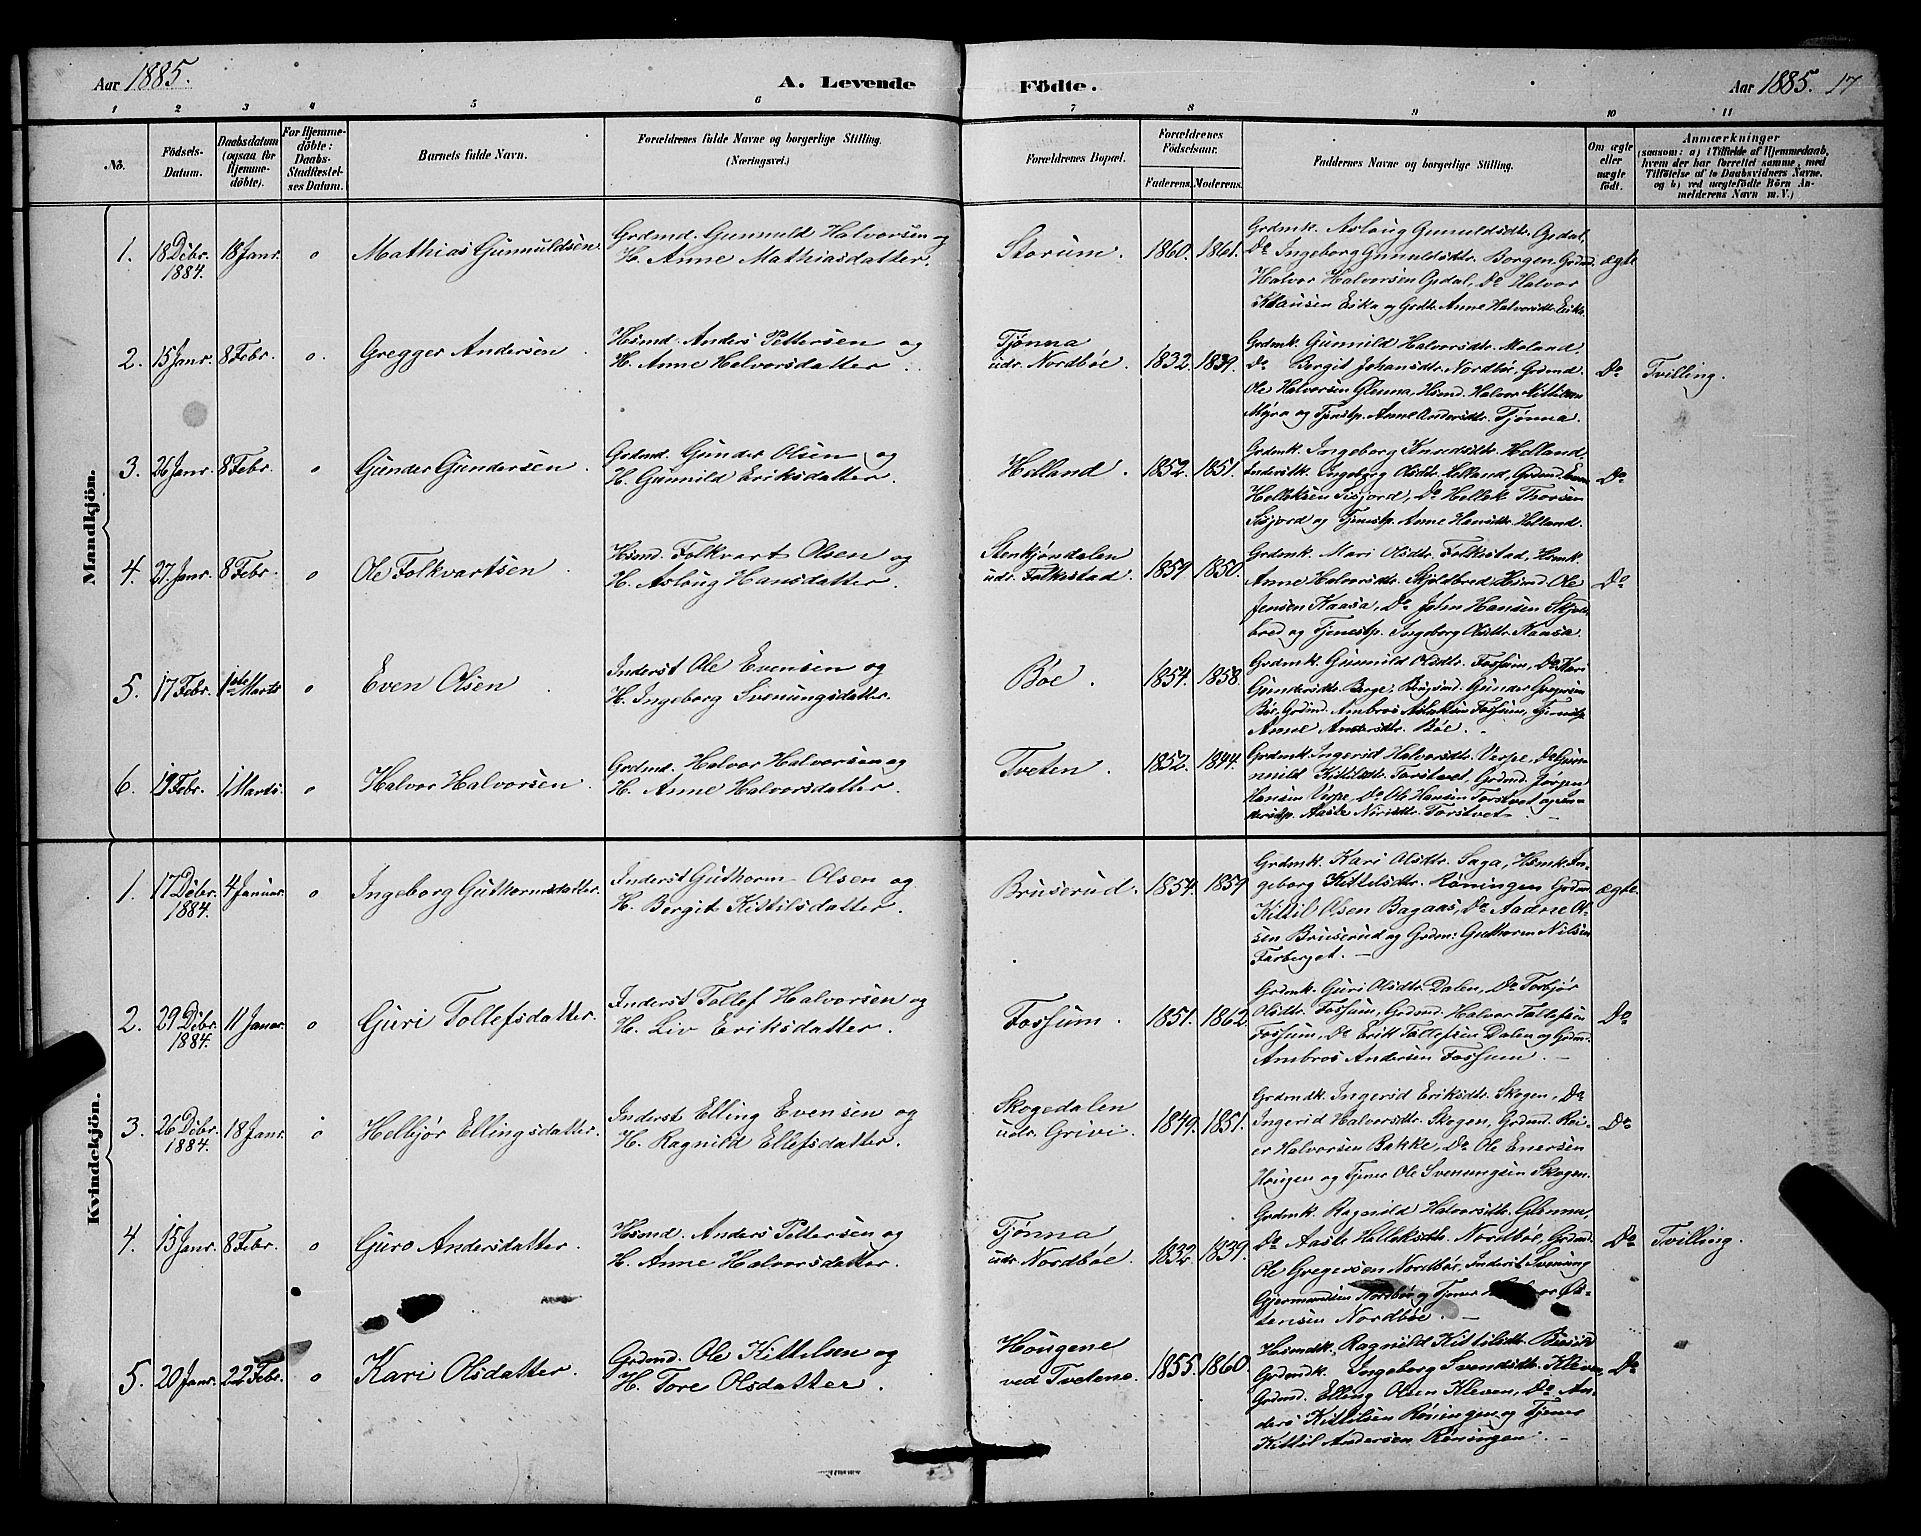 SAKO, Bø kirkebøker, G/Ga/L0005: Klokkerbok nr. 5, 1883-1897, s. 17